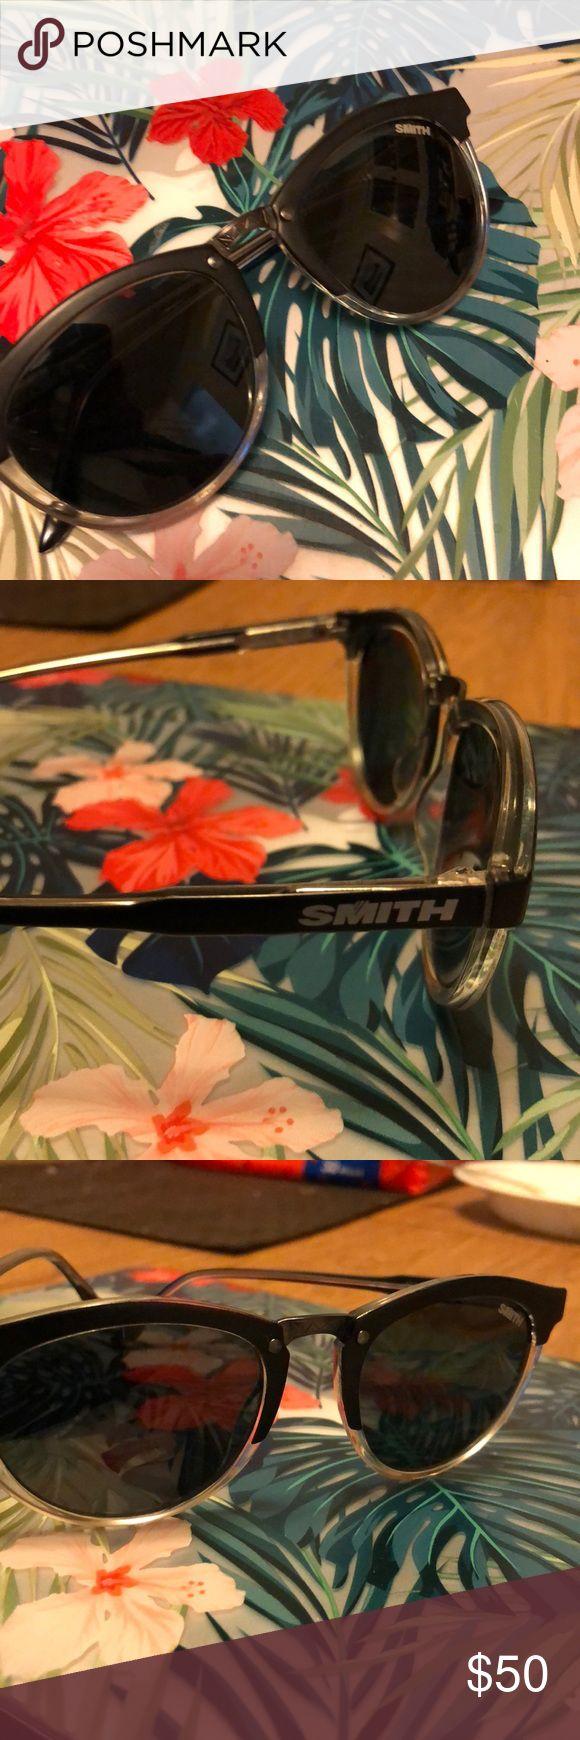 Smith sunglasses Black hipster sunglasses SMITH Accessories Sunglasses